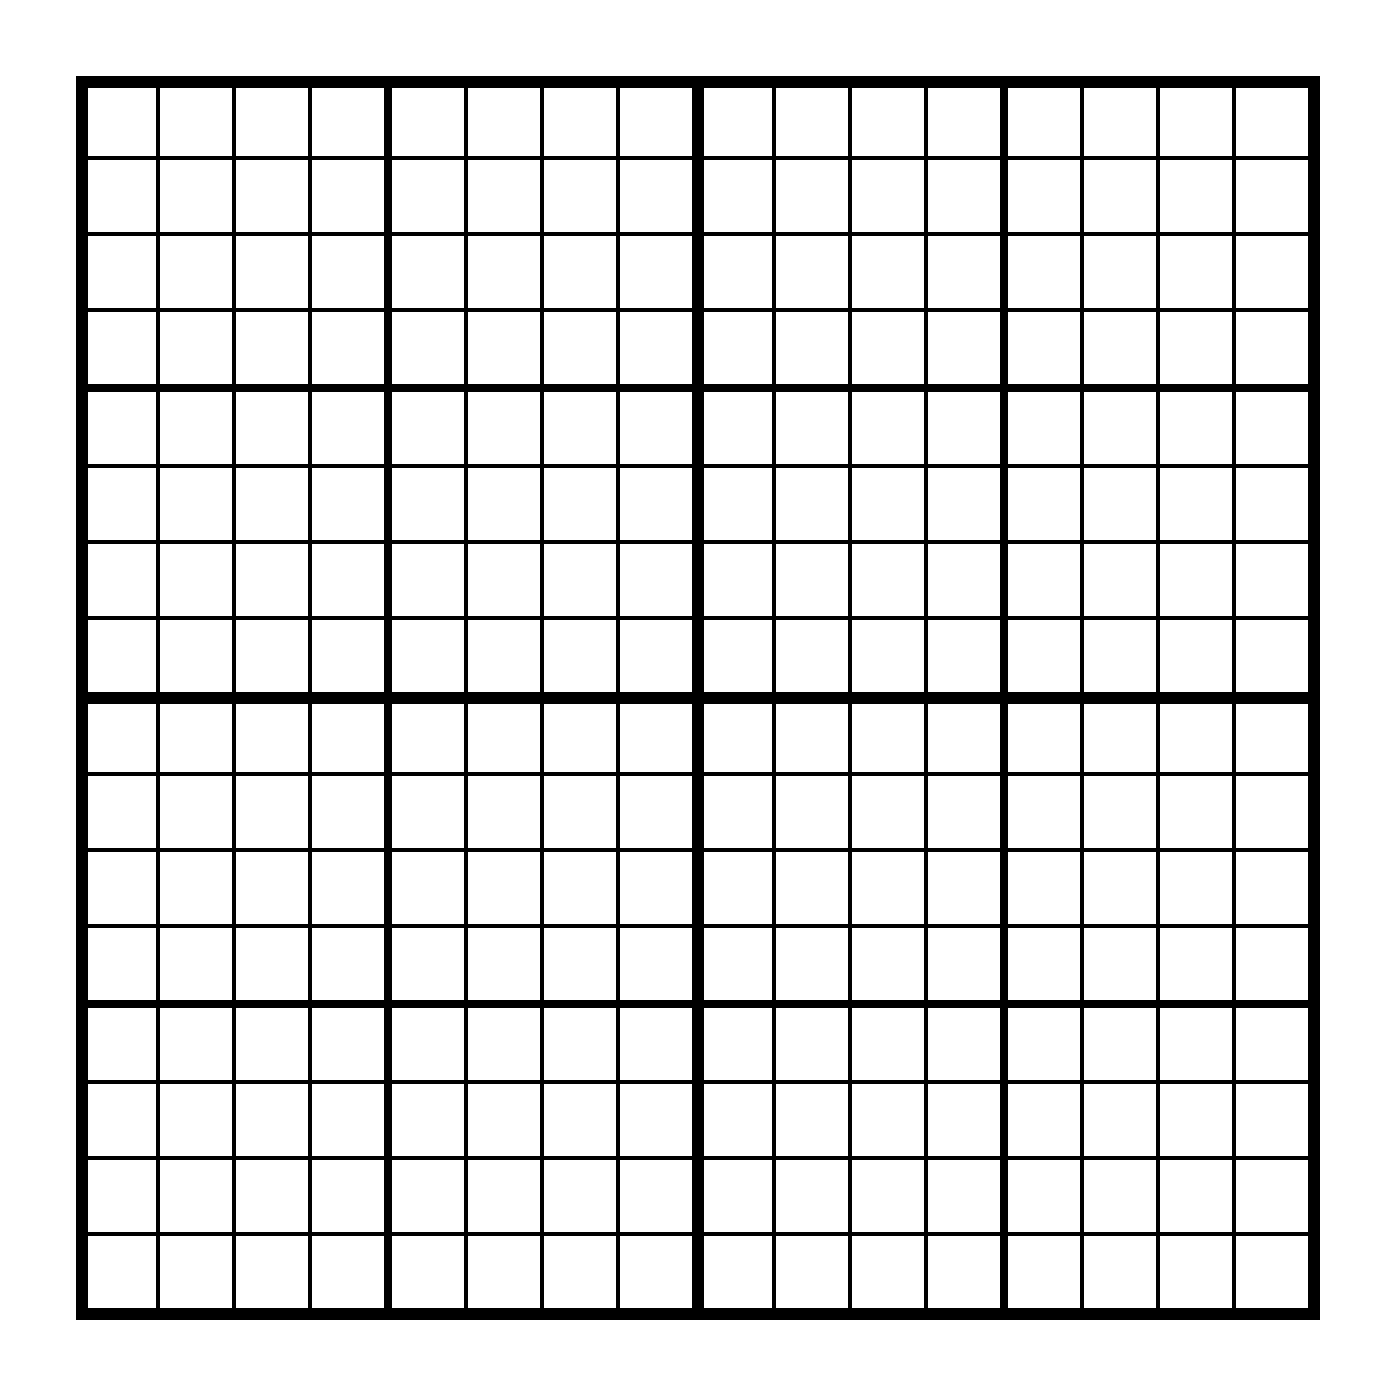 File:pattern Grid 16X16 - Wikimedia Commons